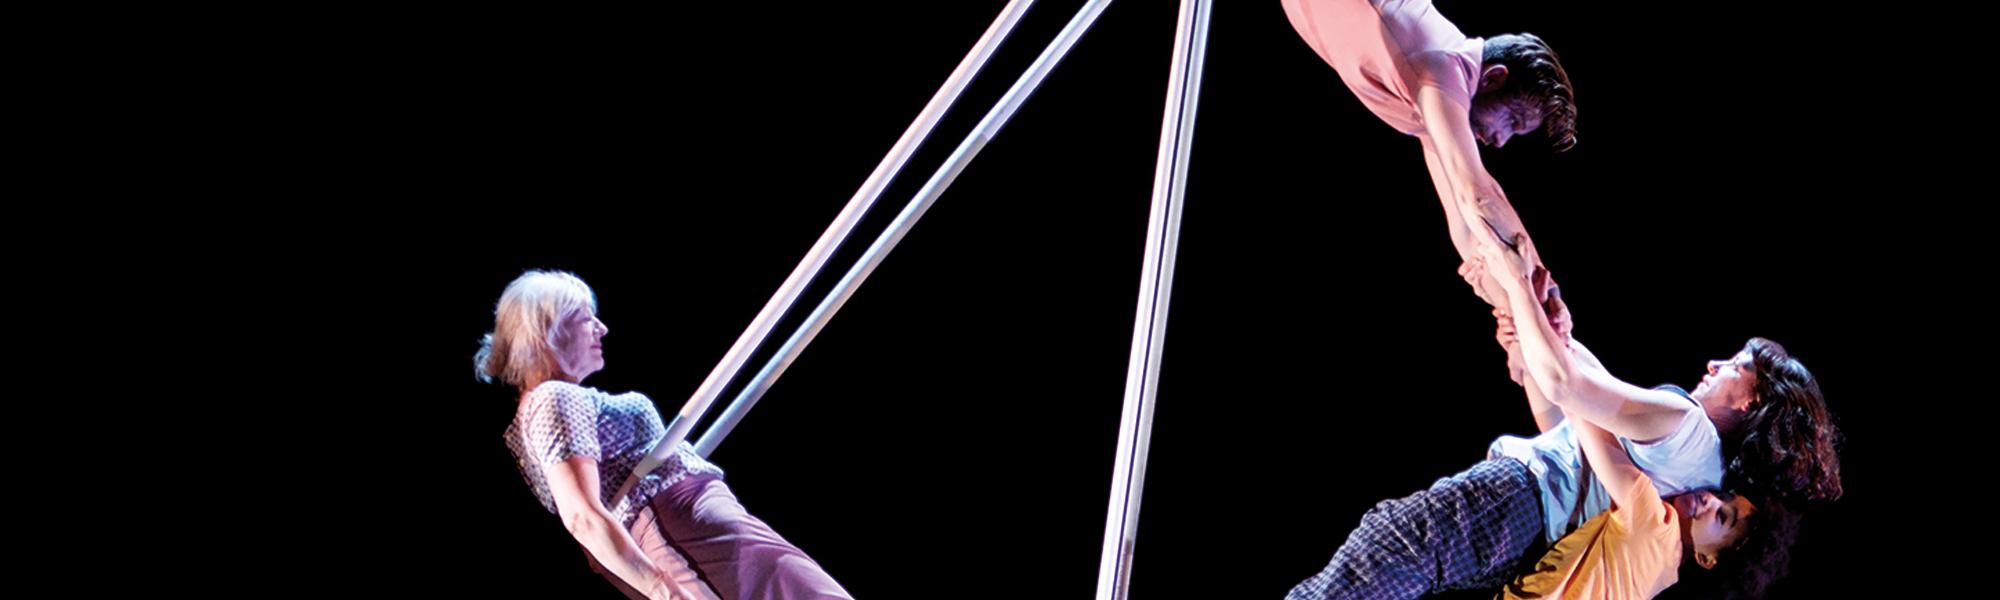 Ockham's Razor performers swinging from trapeze behind black background